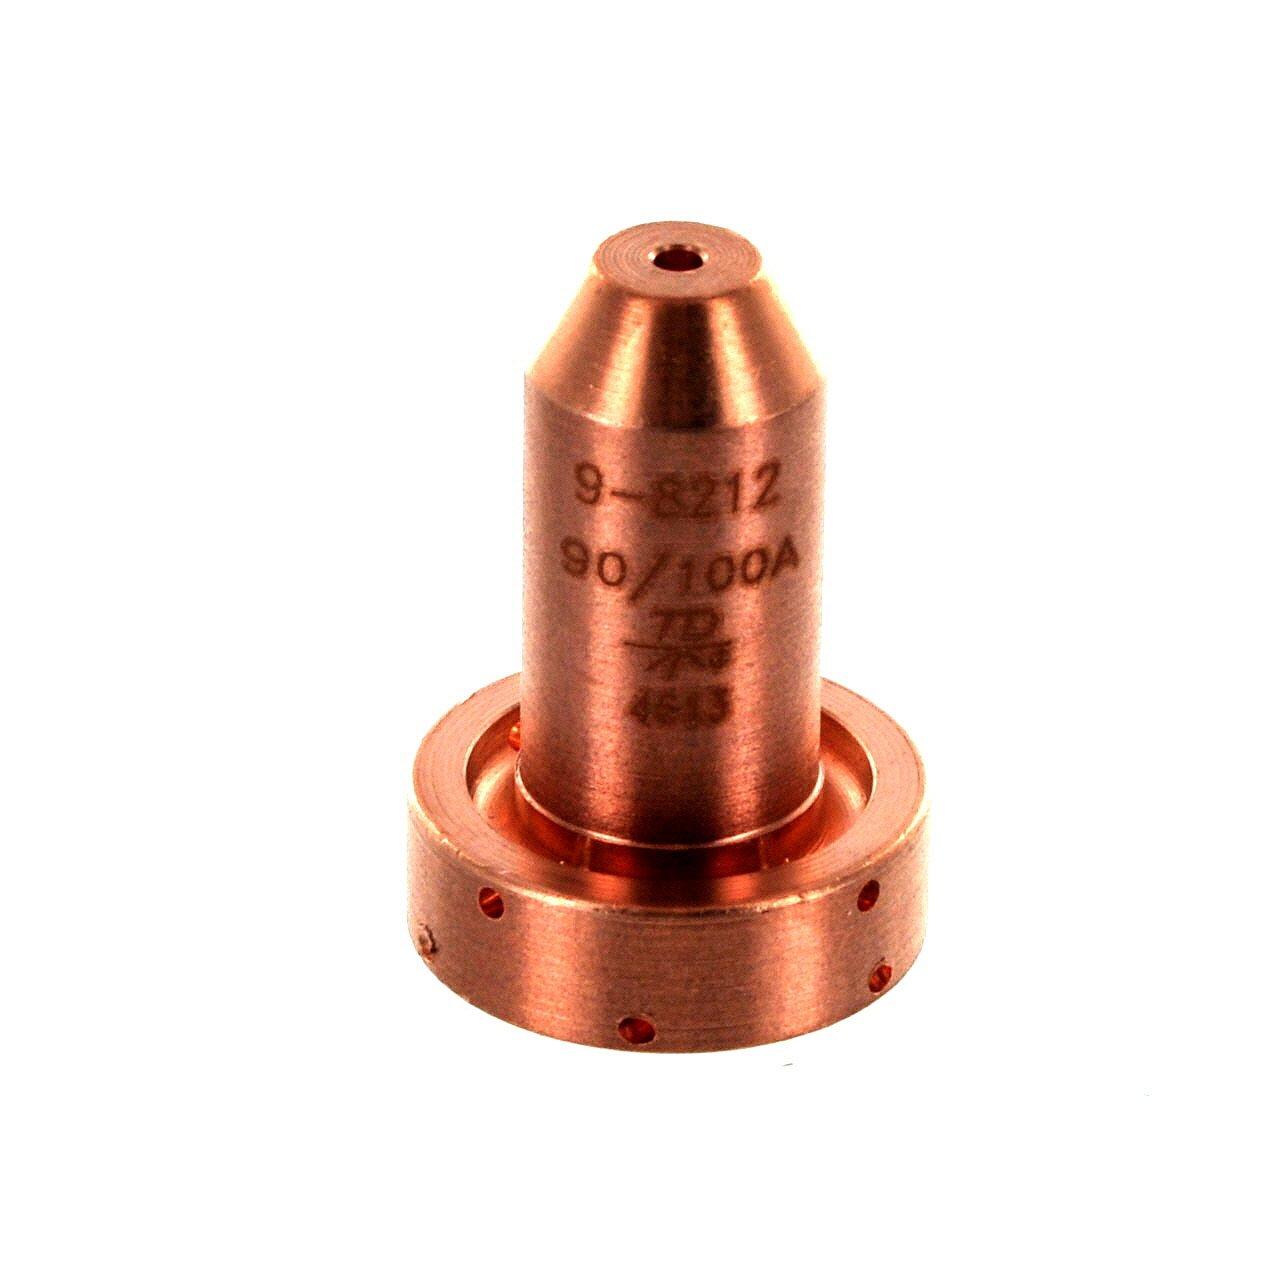 for SL60//SL100 90-100 Amp Thermal Dynamics 9-8212 SL60//SL100 Tips